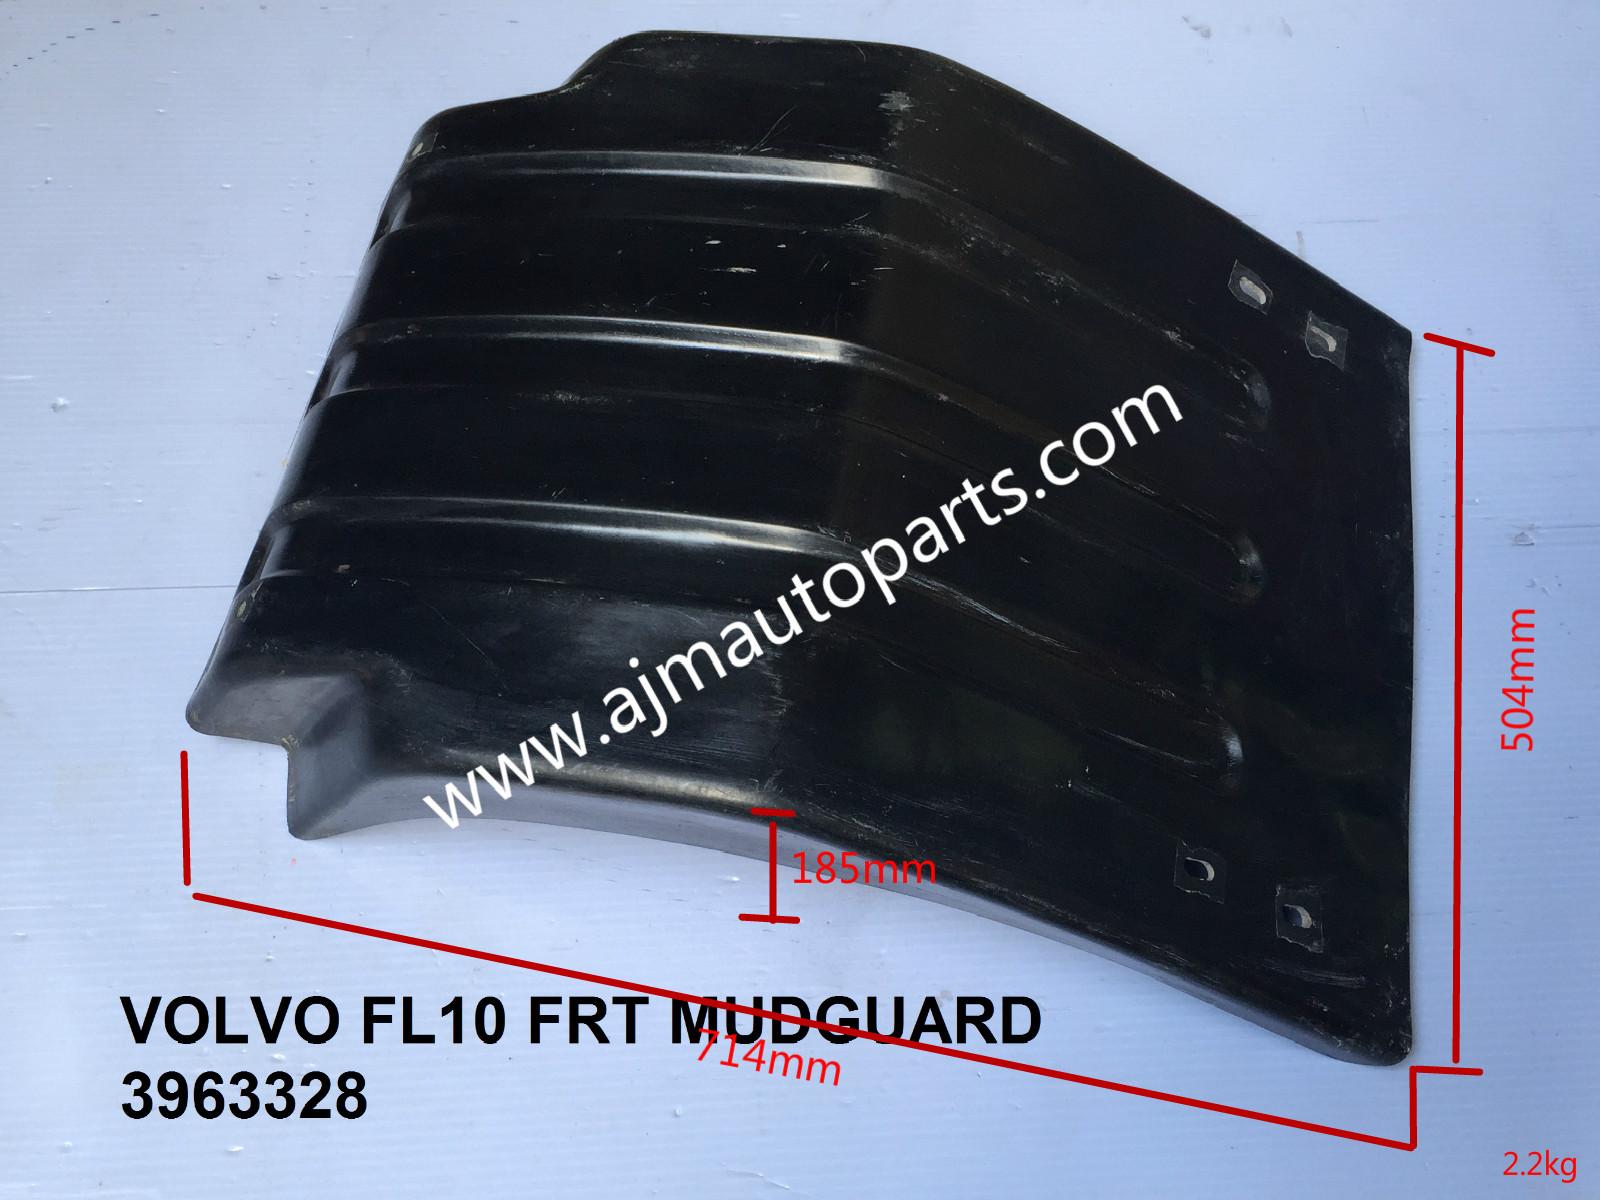 VOLVO FL10 FRT MUDGUARD -39633288